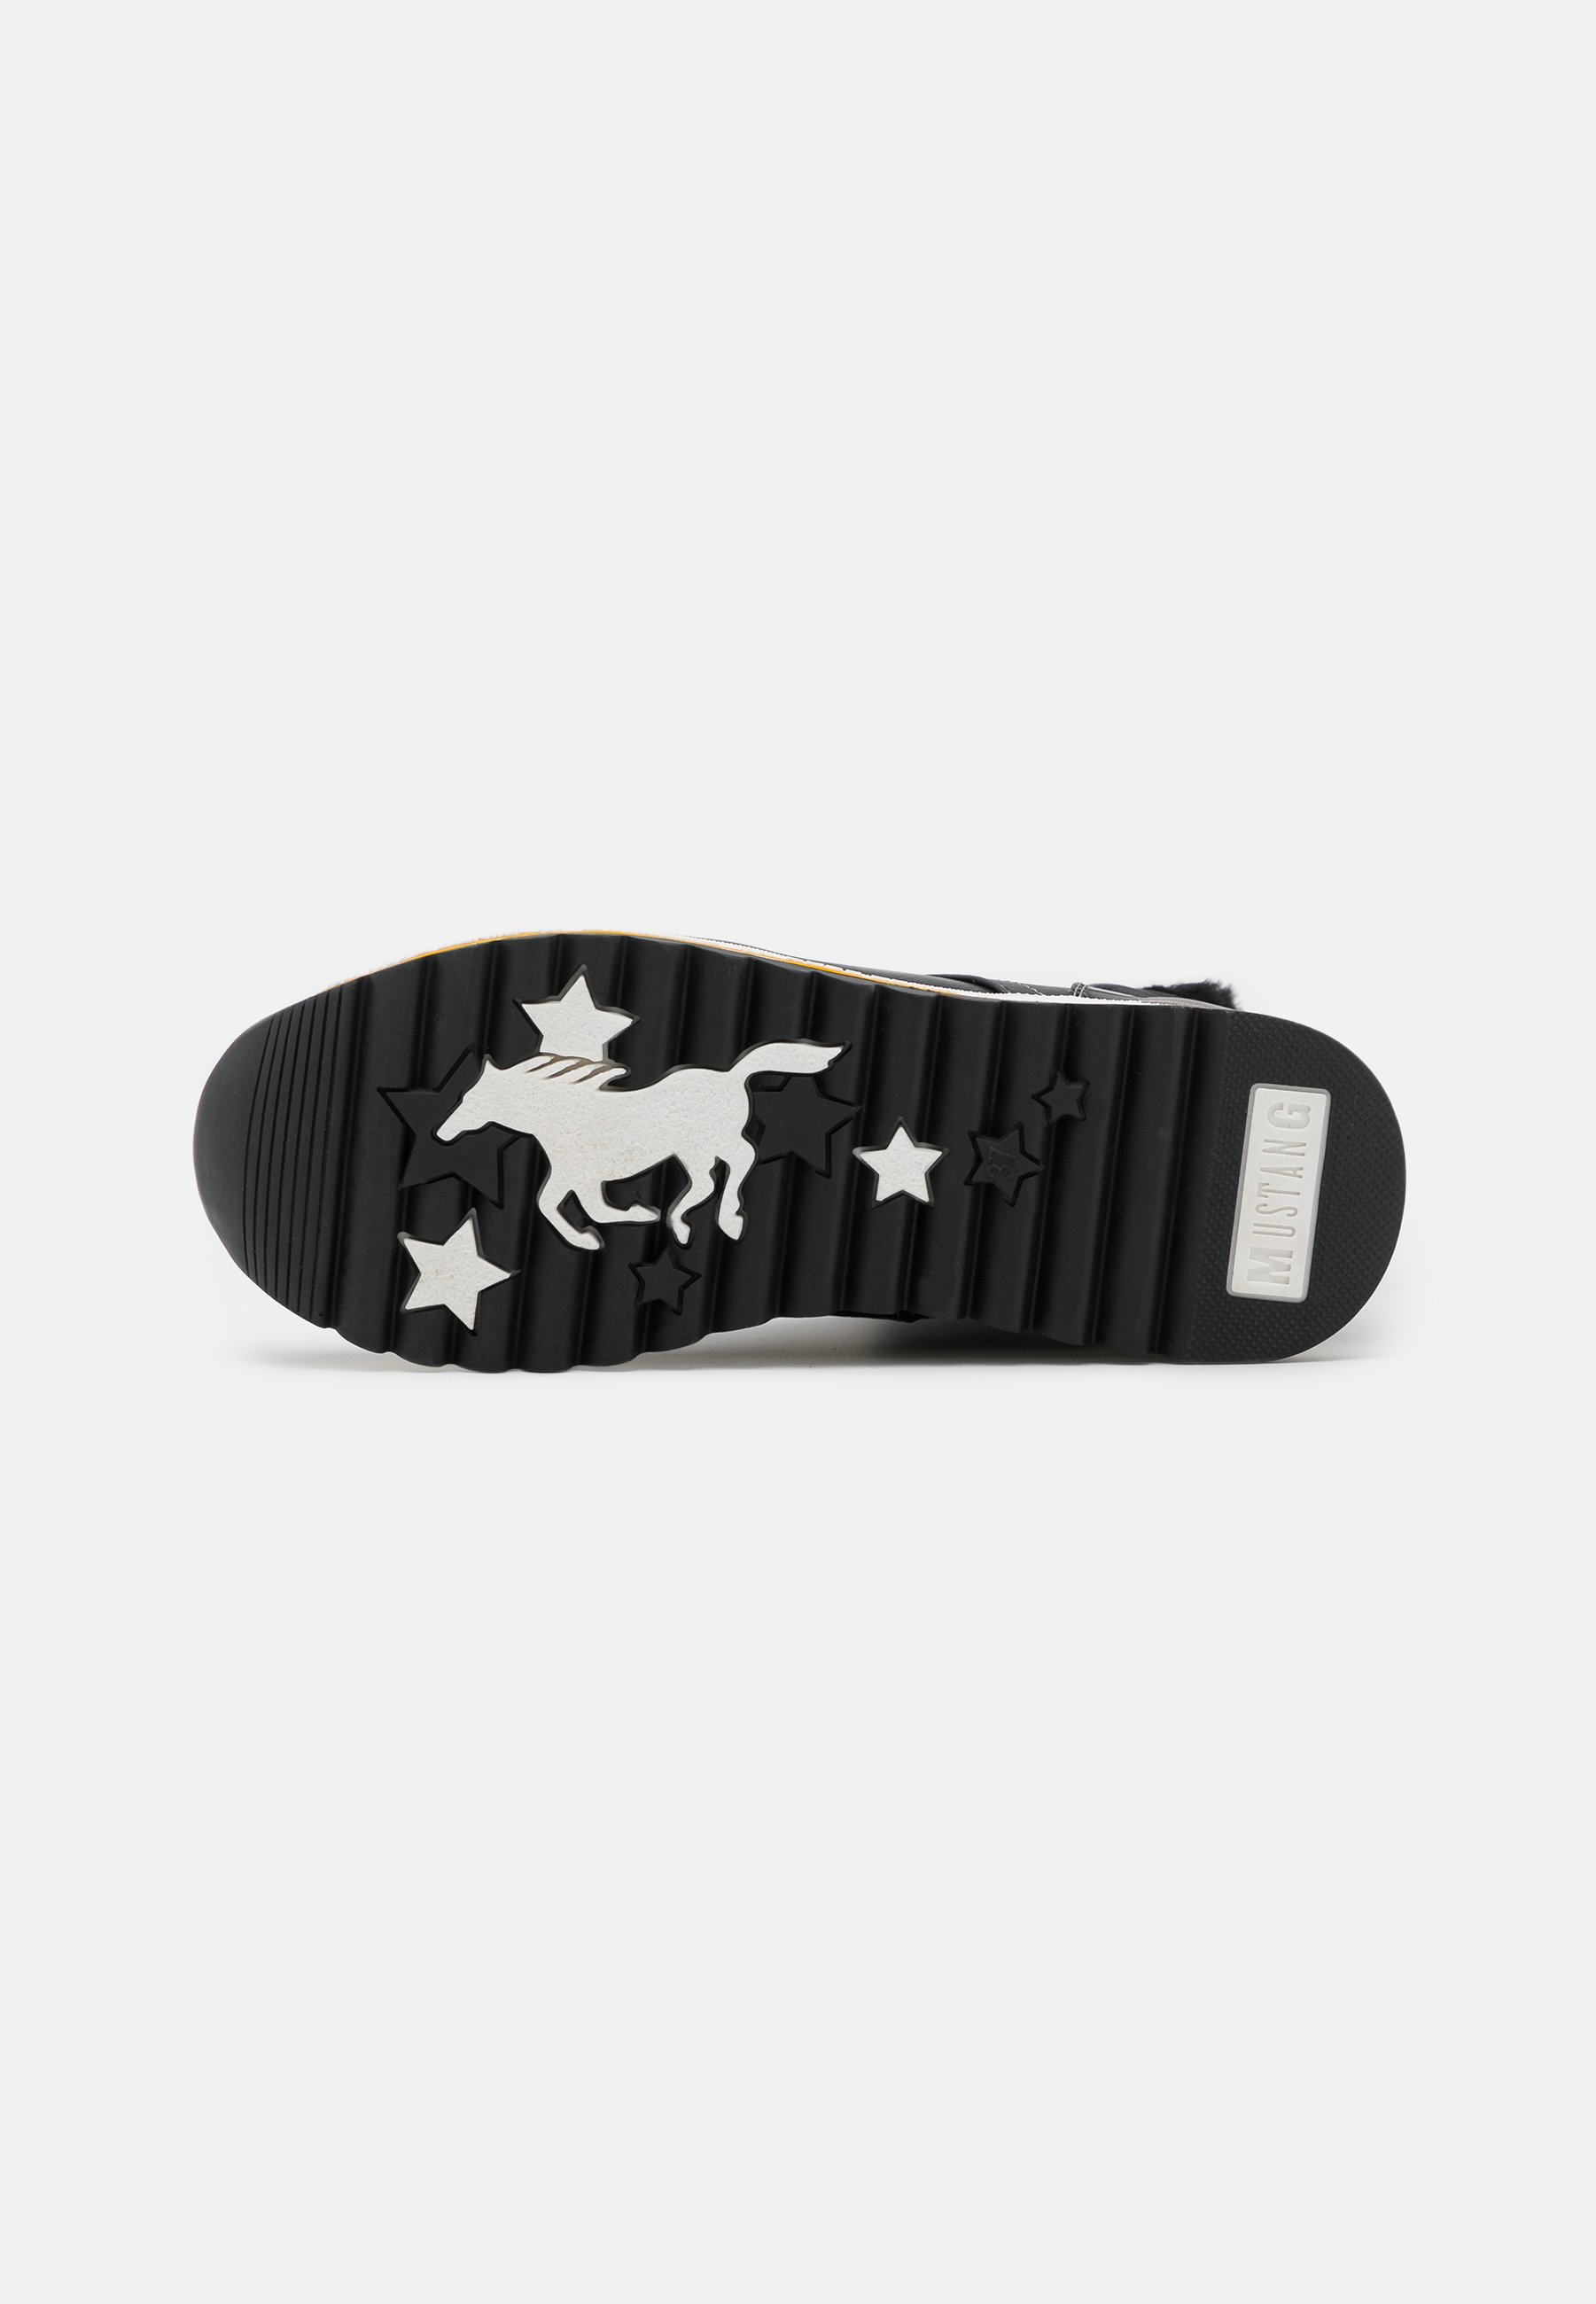 Mustang Plateaustiefelette schwarz/gelb/schwarz